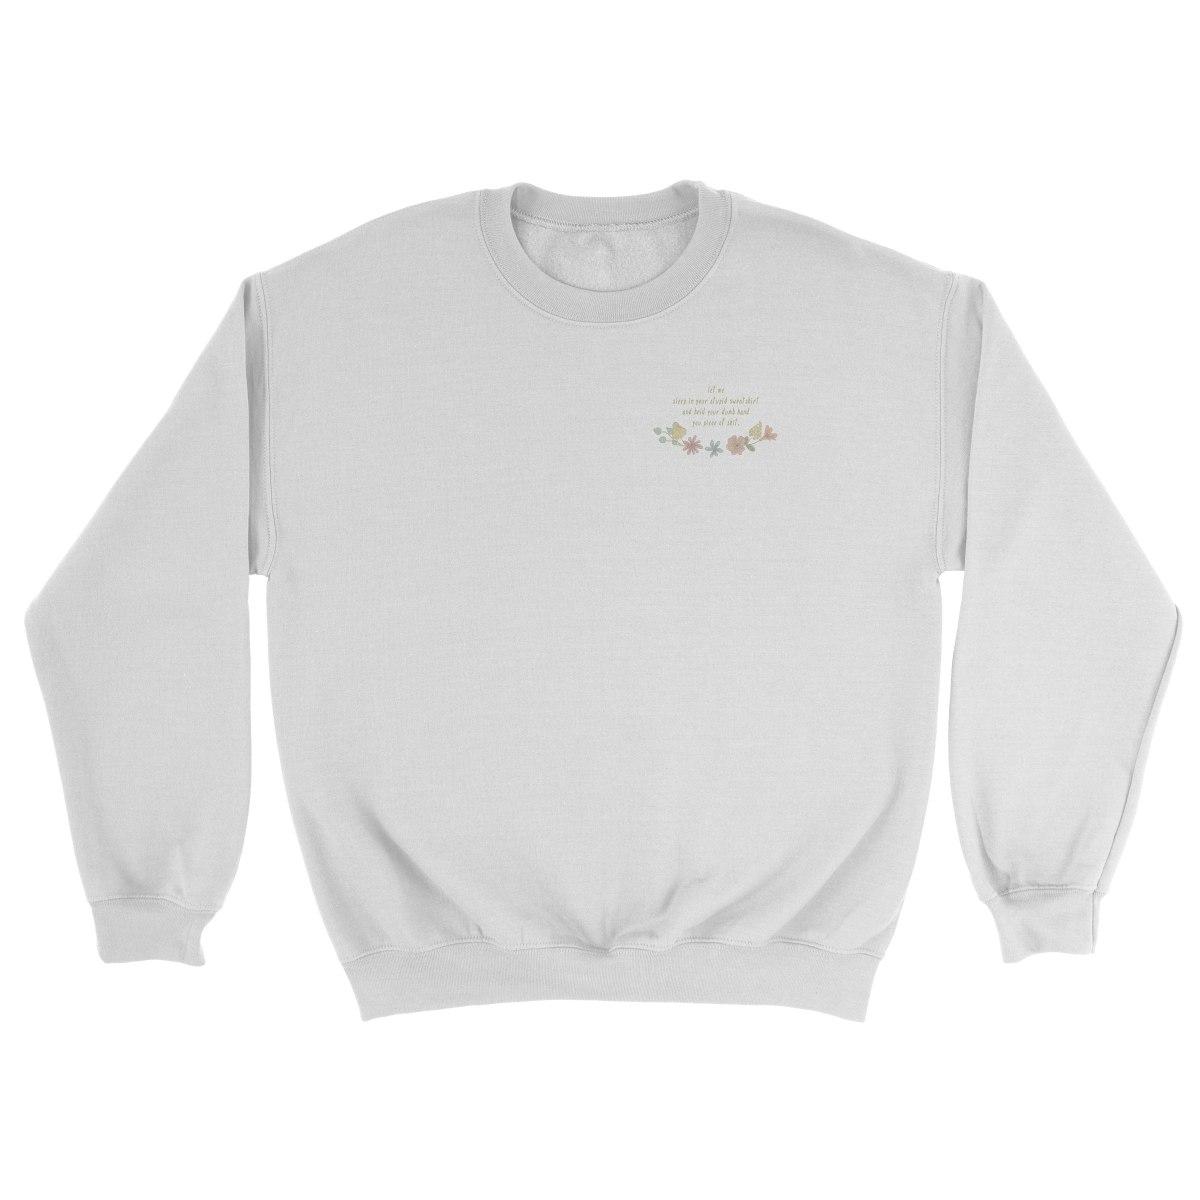 YOUR STUPID SWEATSHIRT white crew sweatshirt by kikicutt